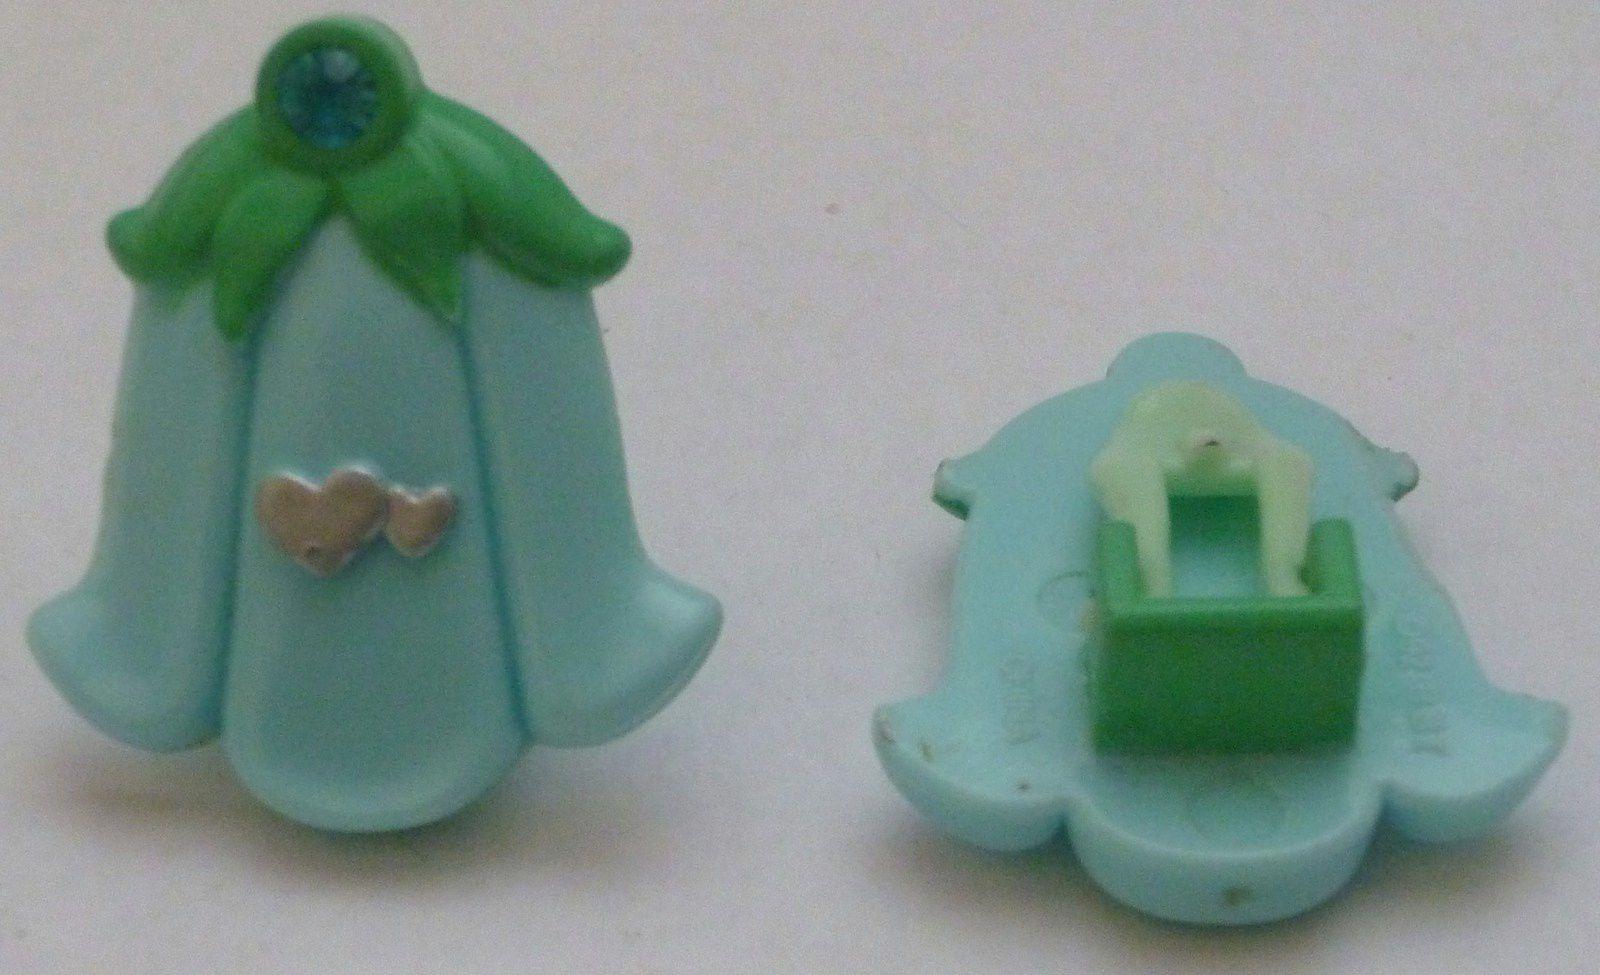 Polly Pocket 1992 Magic Wishing Bell variante verte